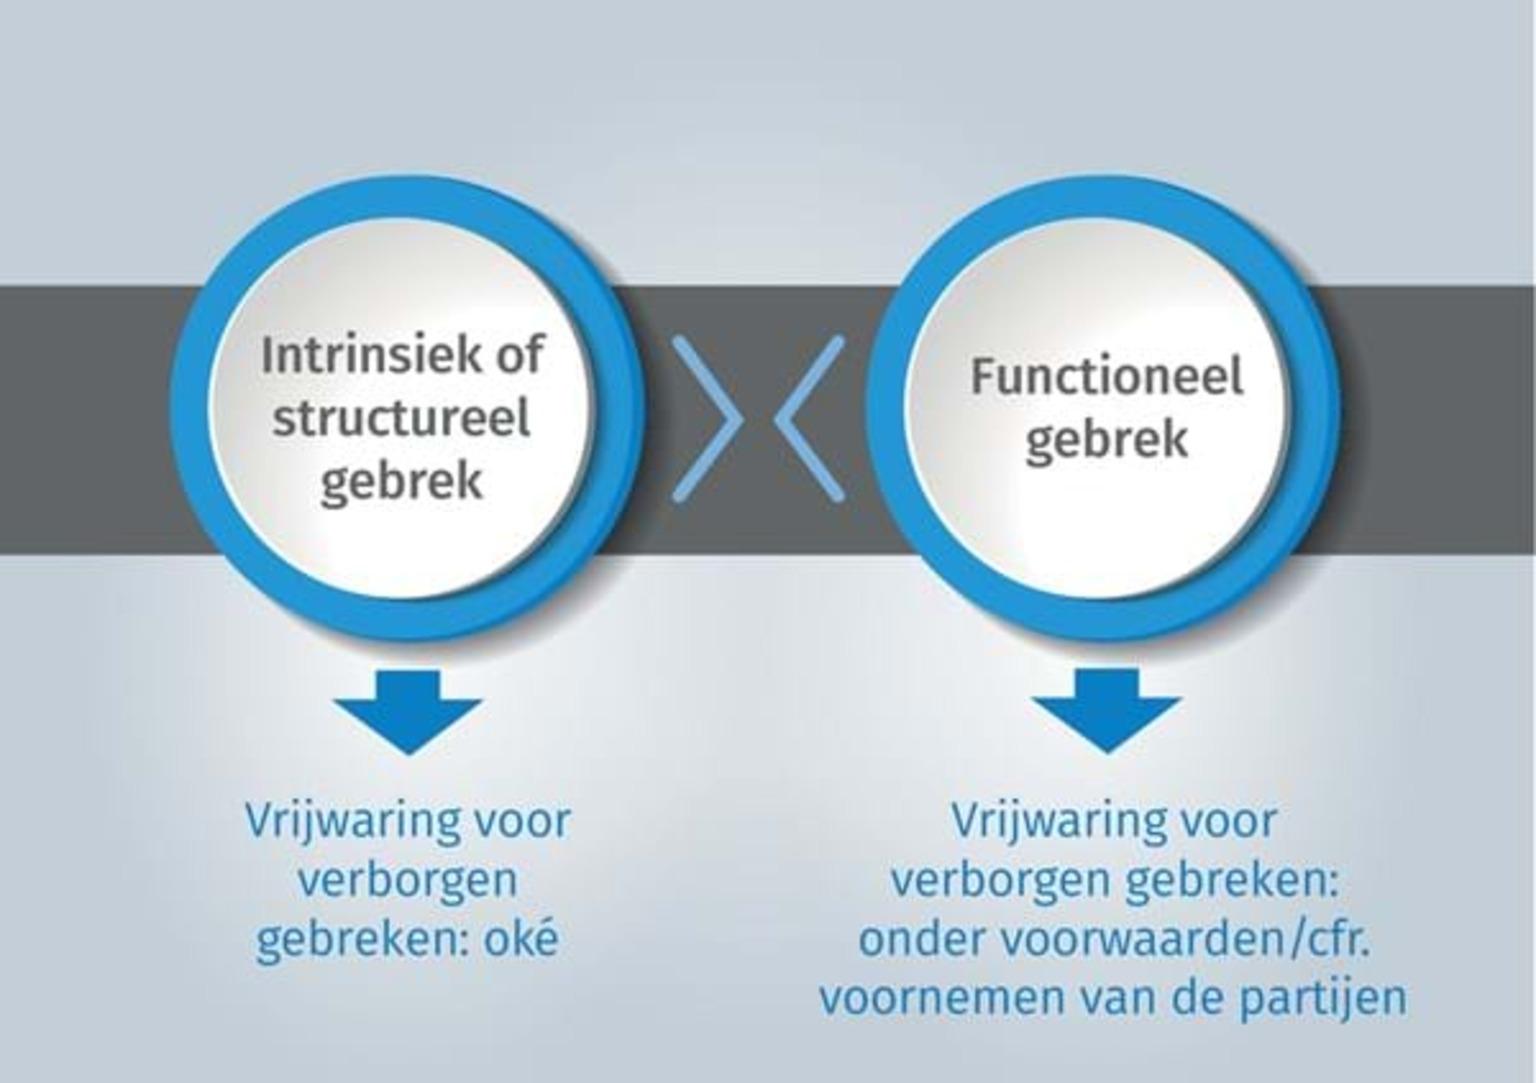 Onderscheid tussen intrinsiek (of structureel) gebrek en functioneel gebrek